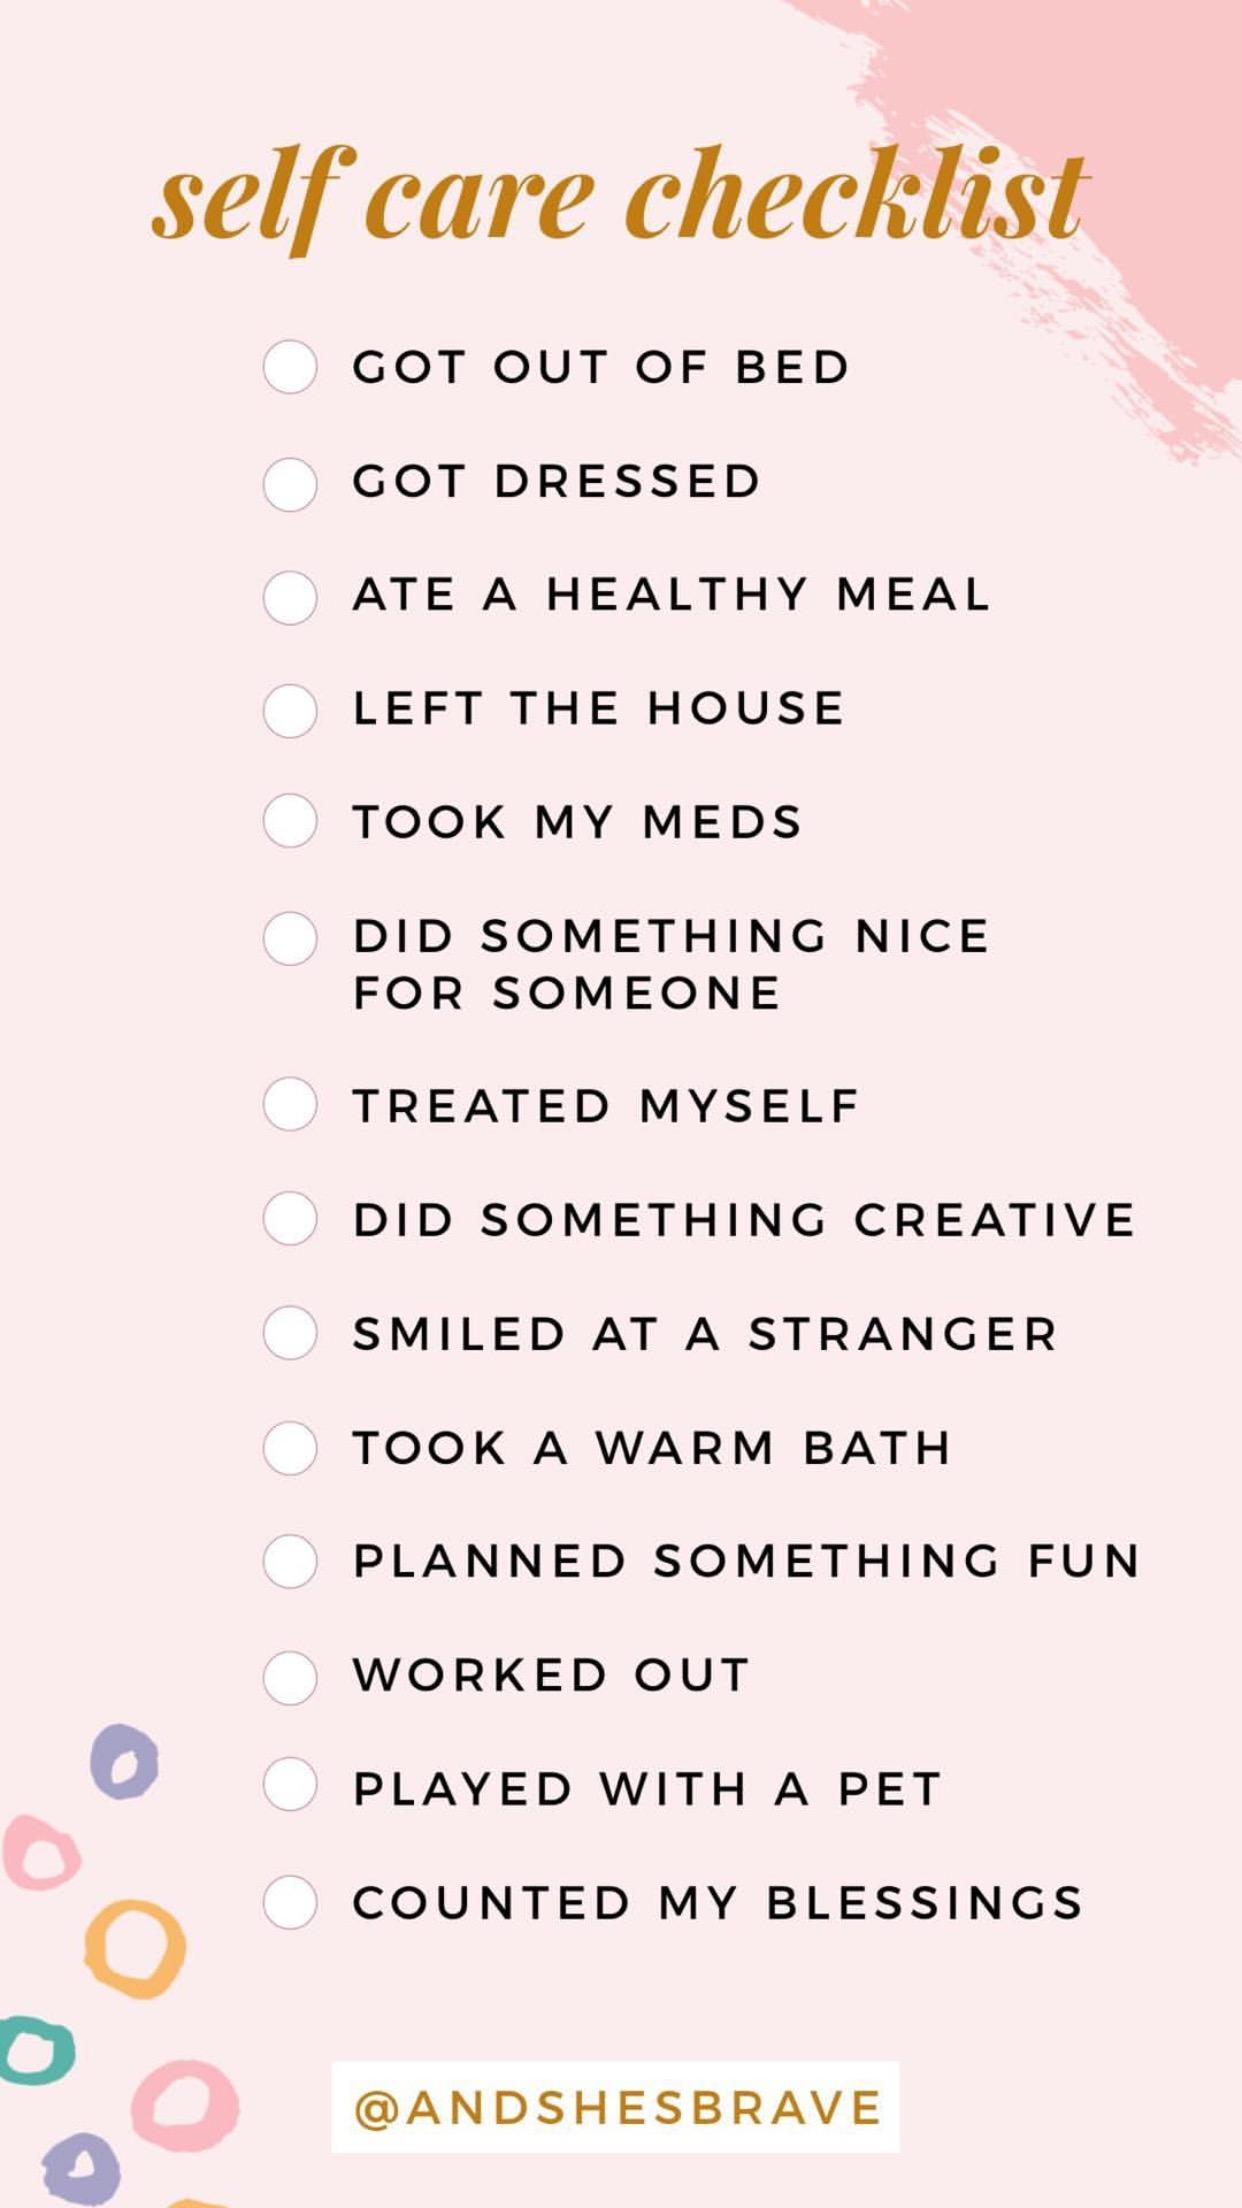 checklist courtesy of @andshesbrave